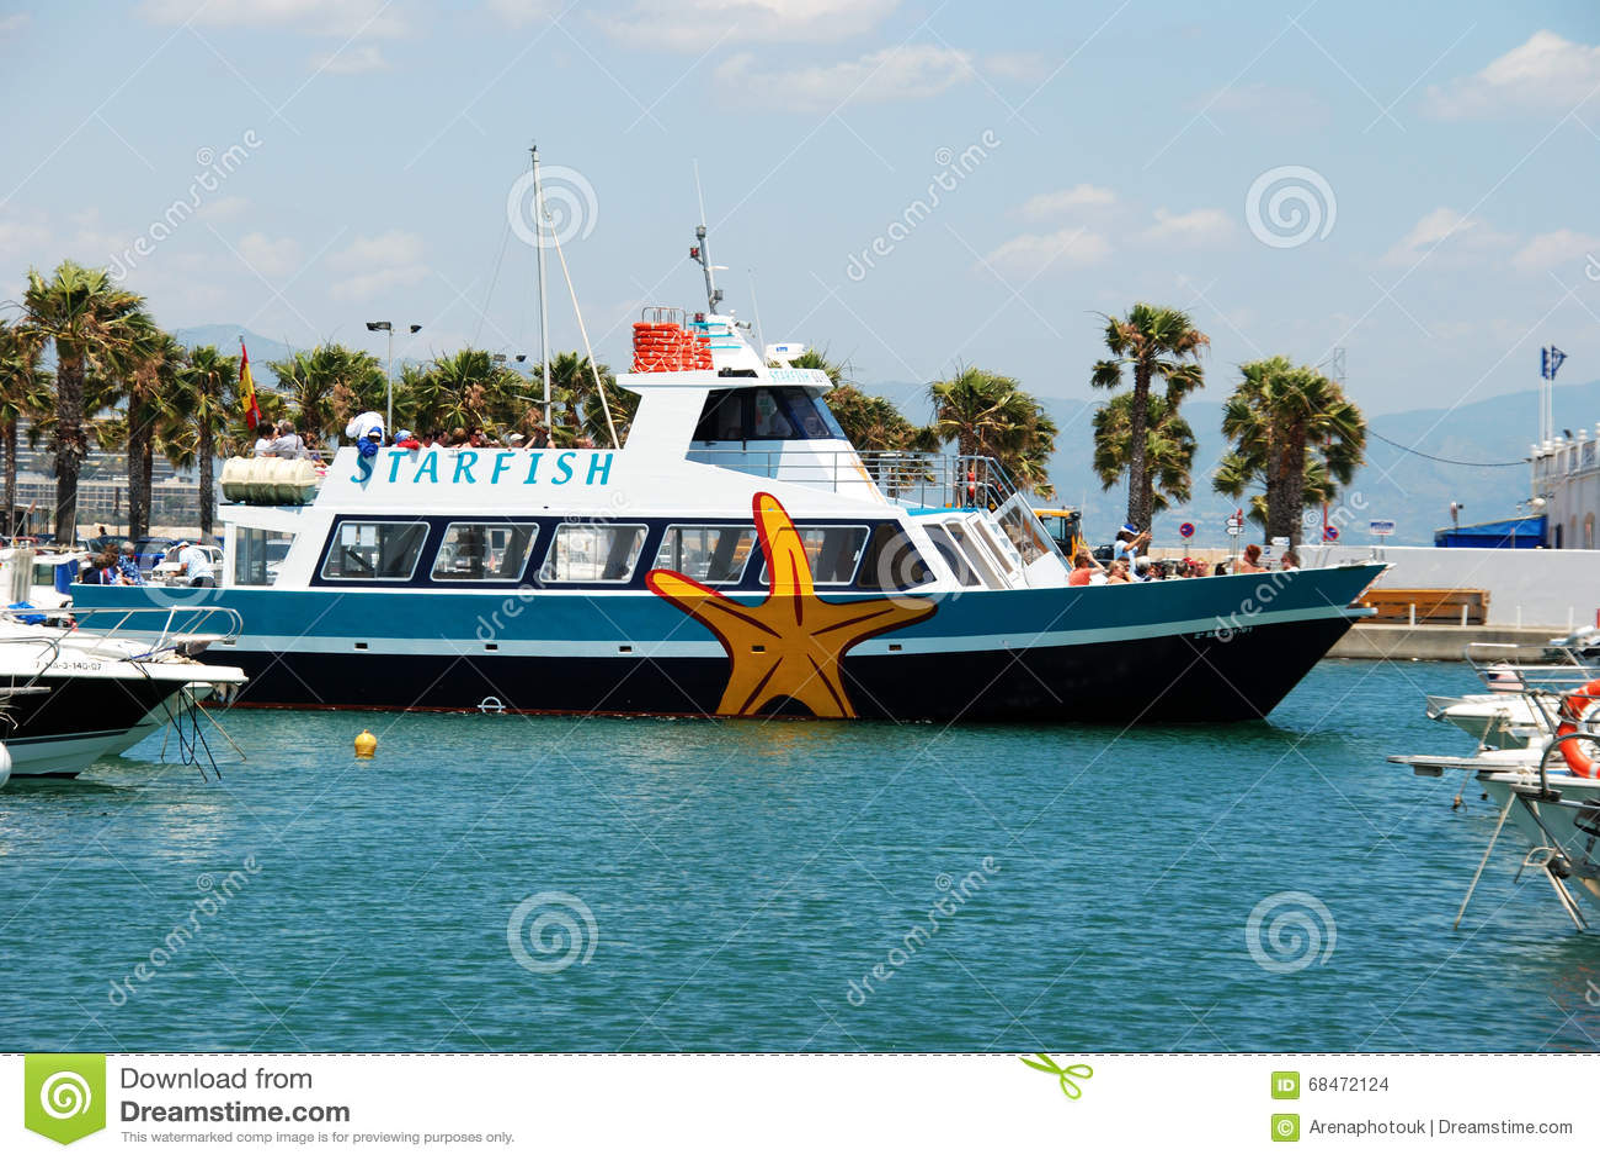 7bc6ea68e8ecf Starfish Boat In Benalmadena Marina. Editorial Stock Image - Image ...